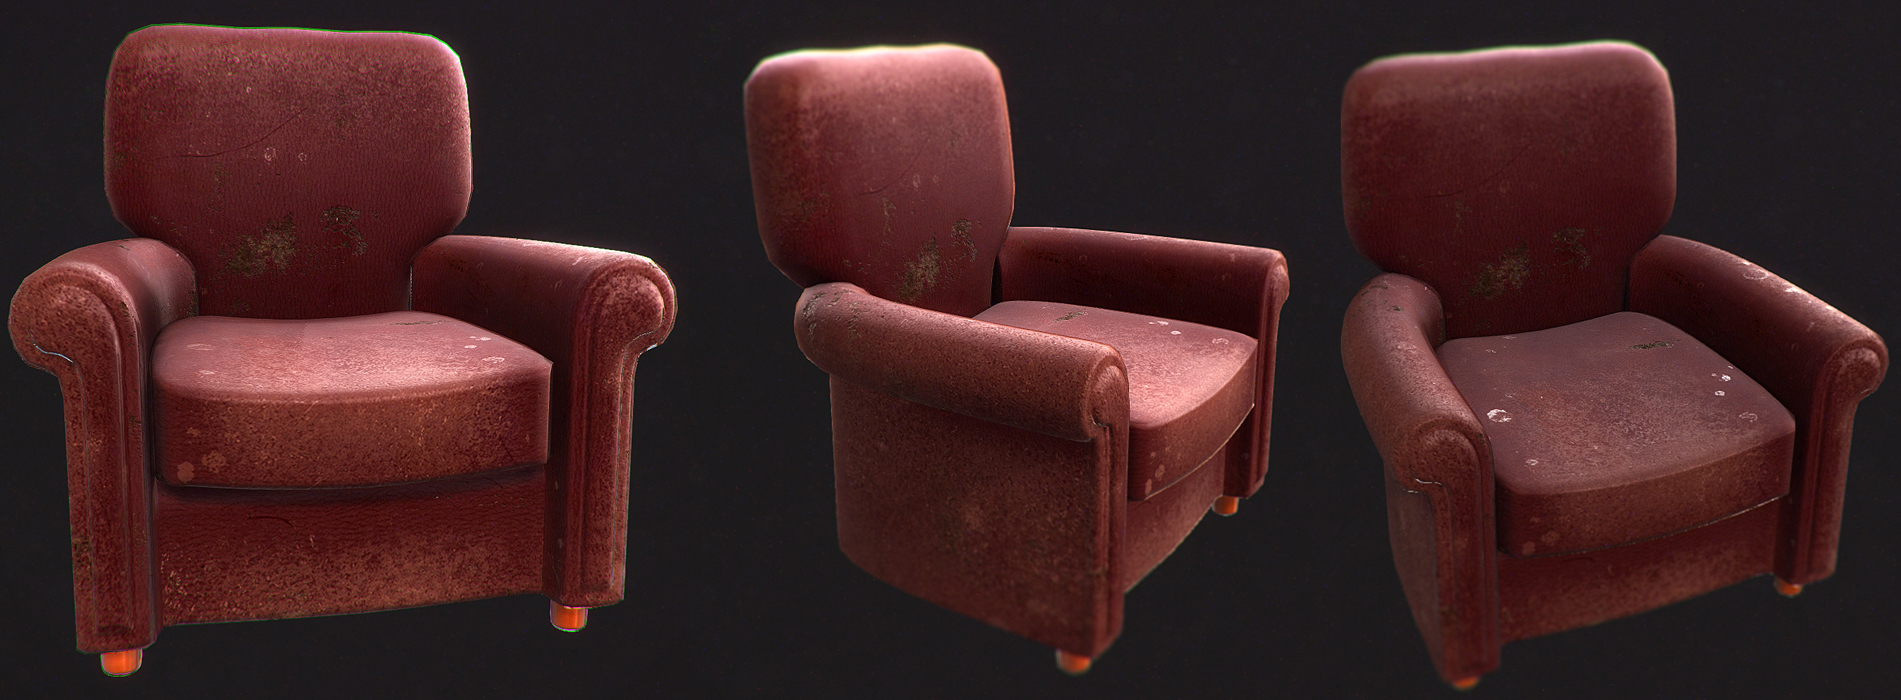 Old Chair chidomocom